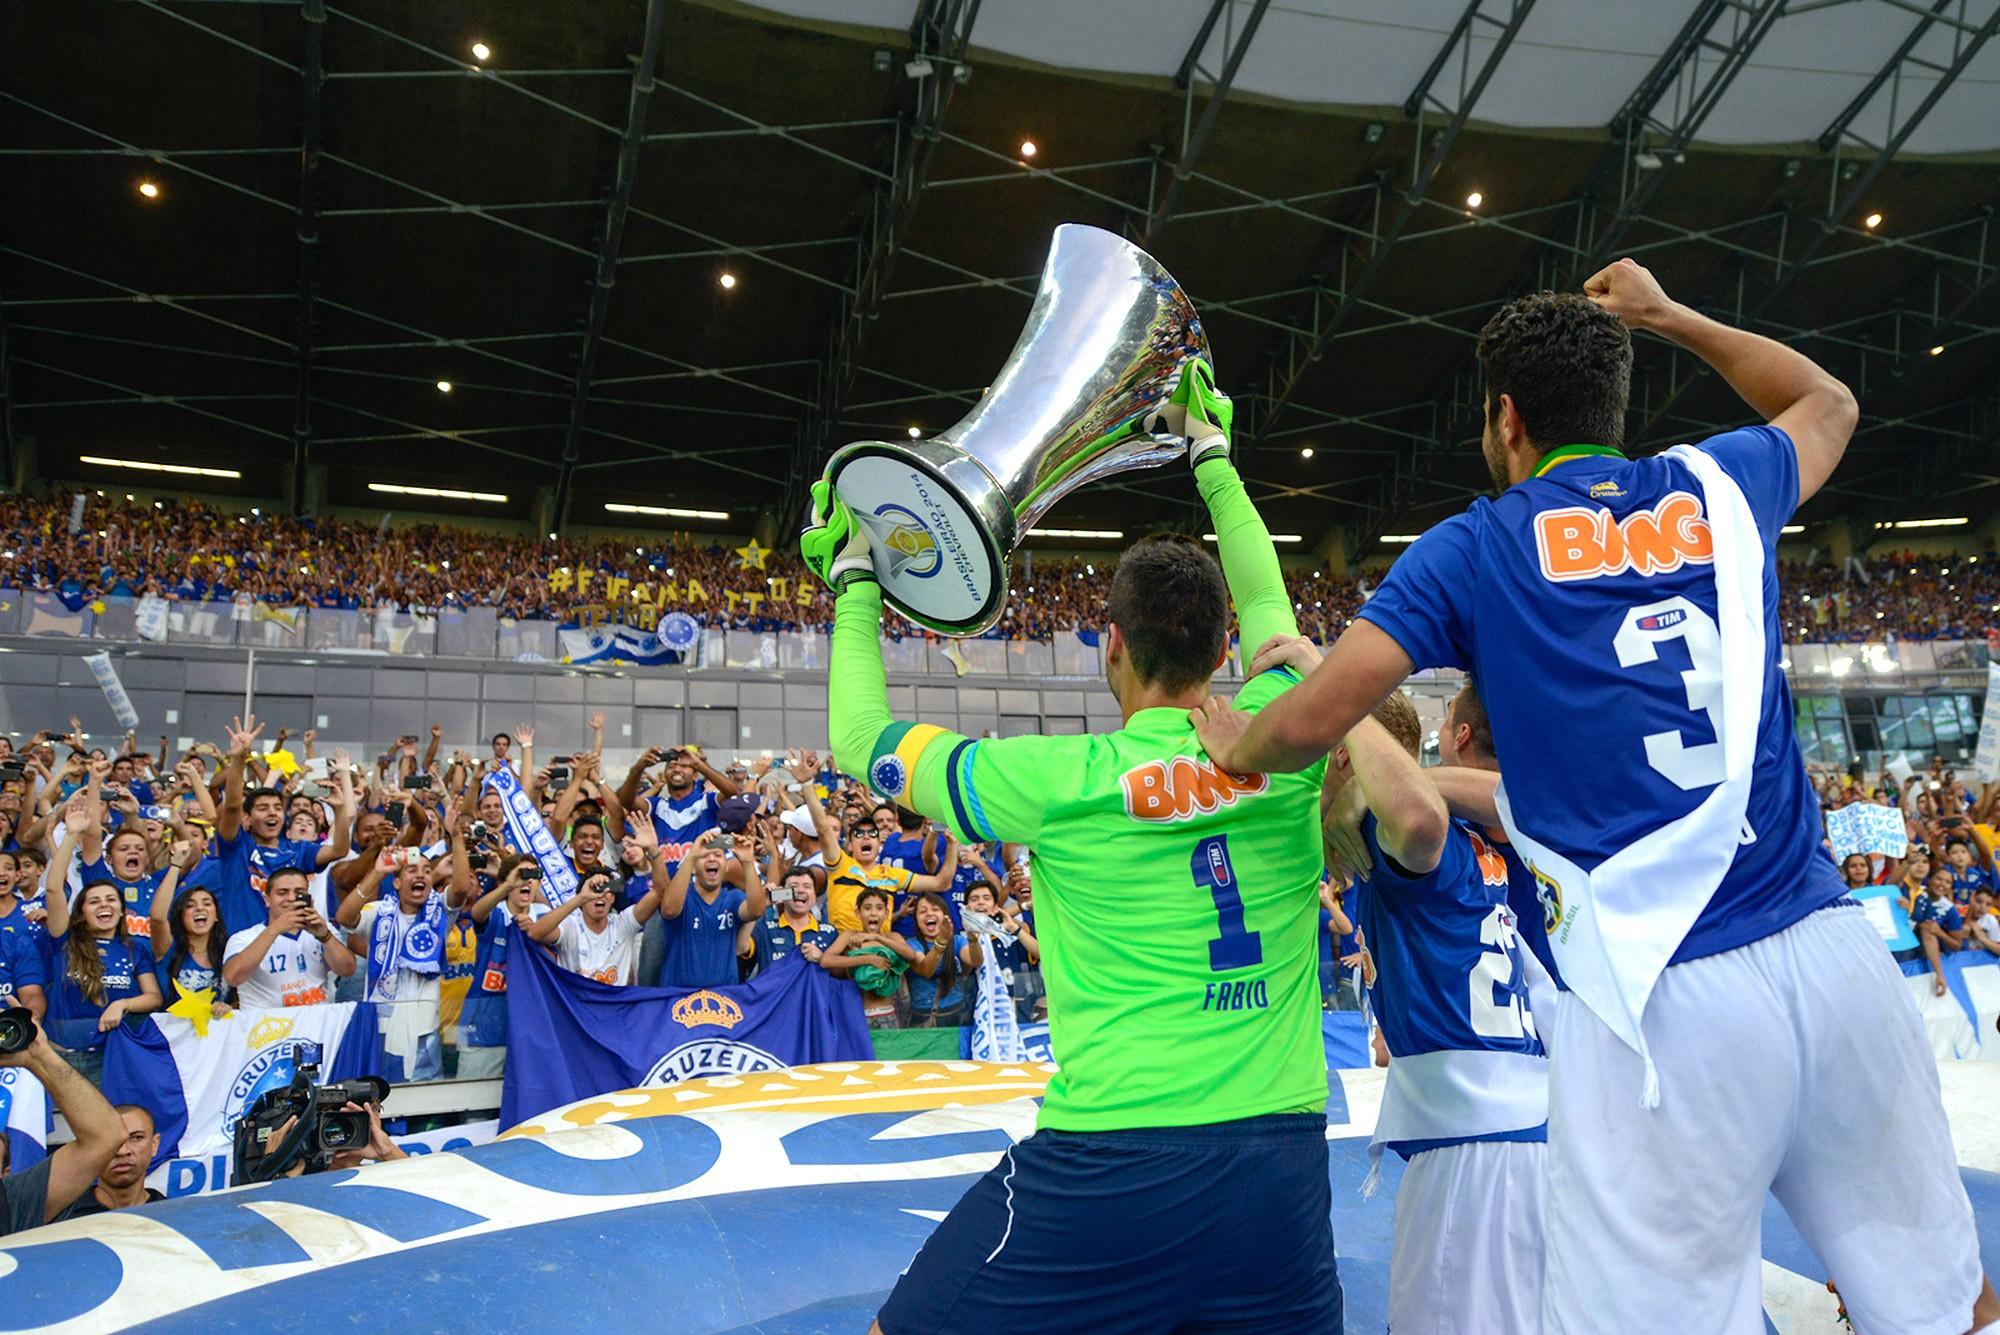 Resumo da Rodada - Campeonato Brasileiro 2014 | SporTV